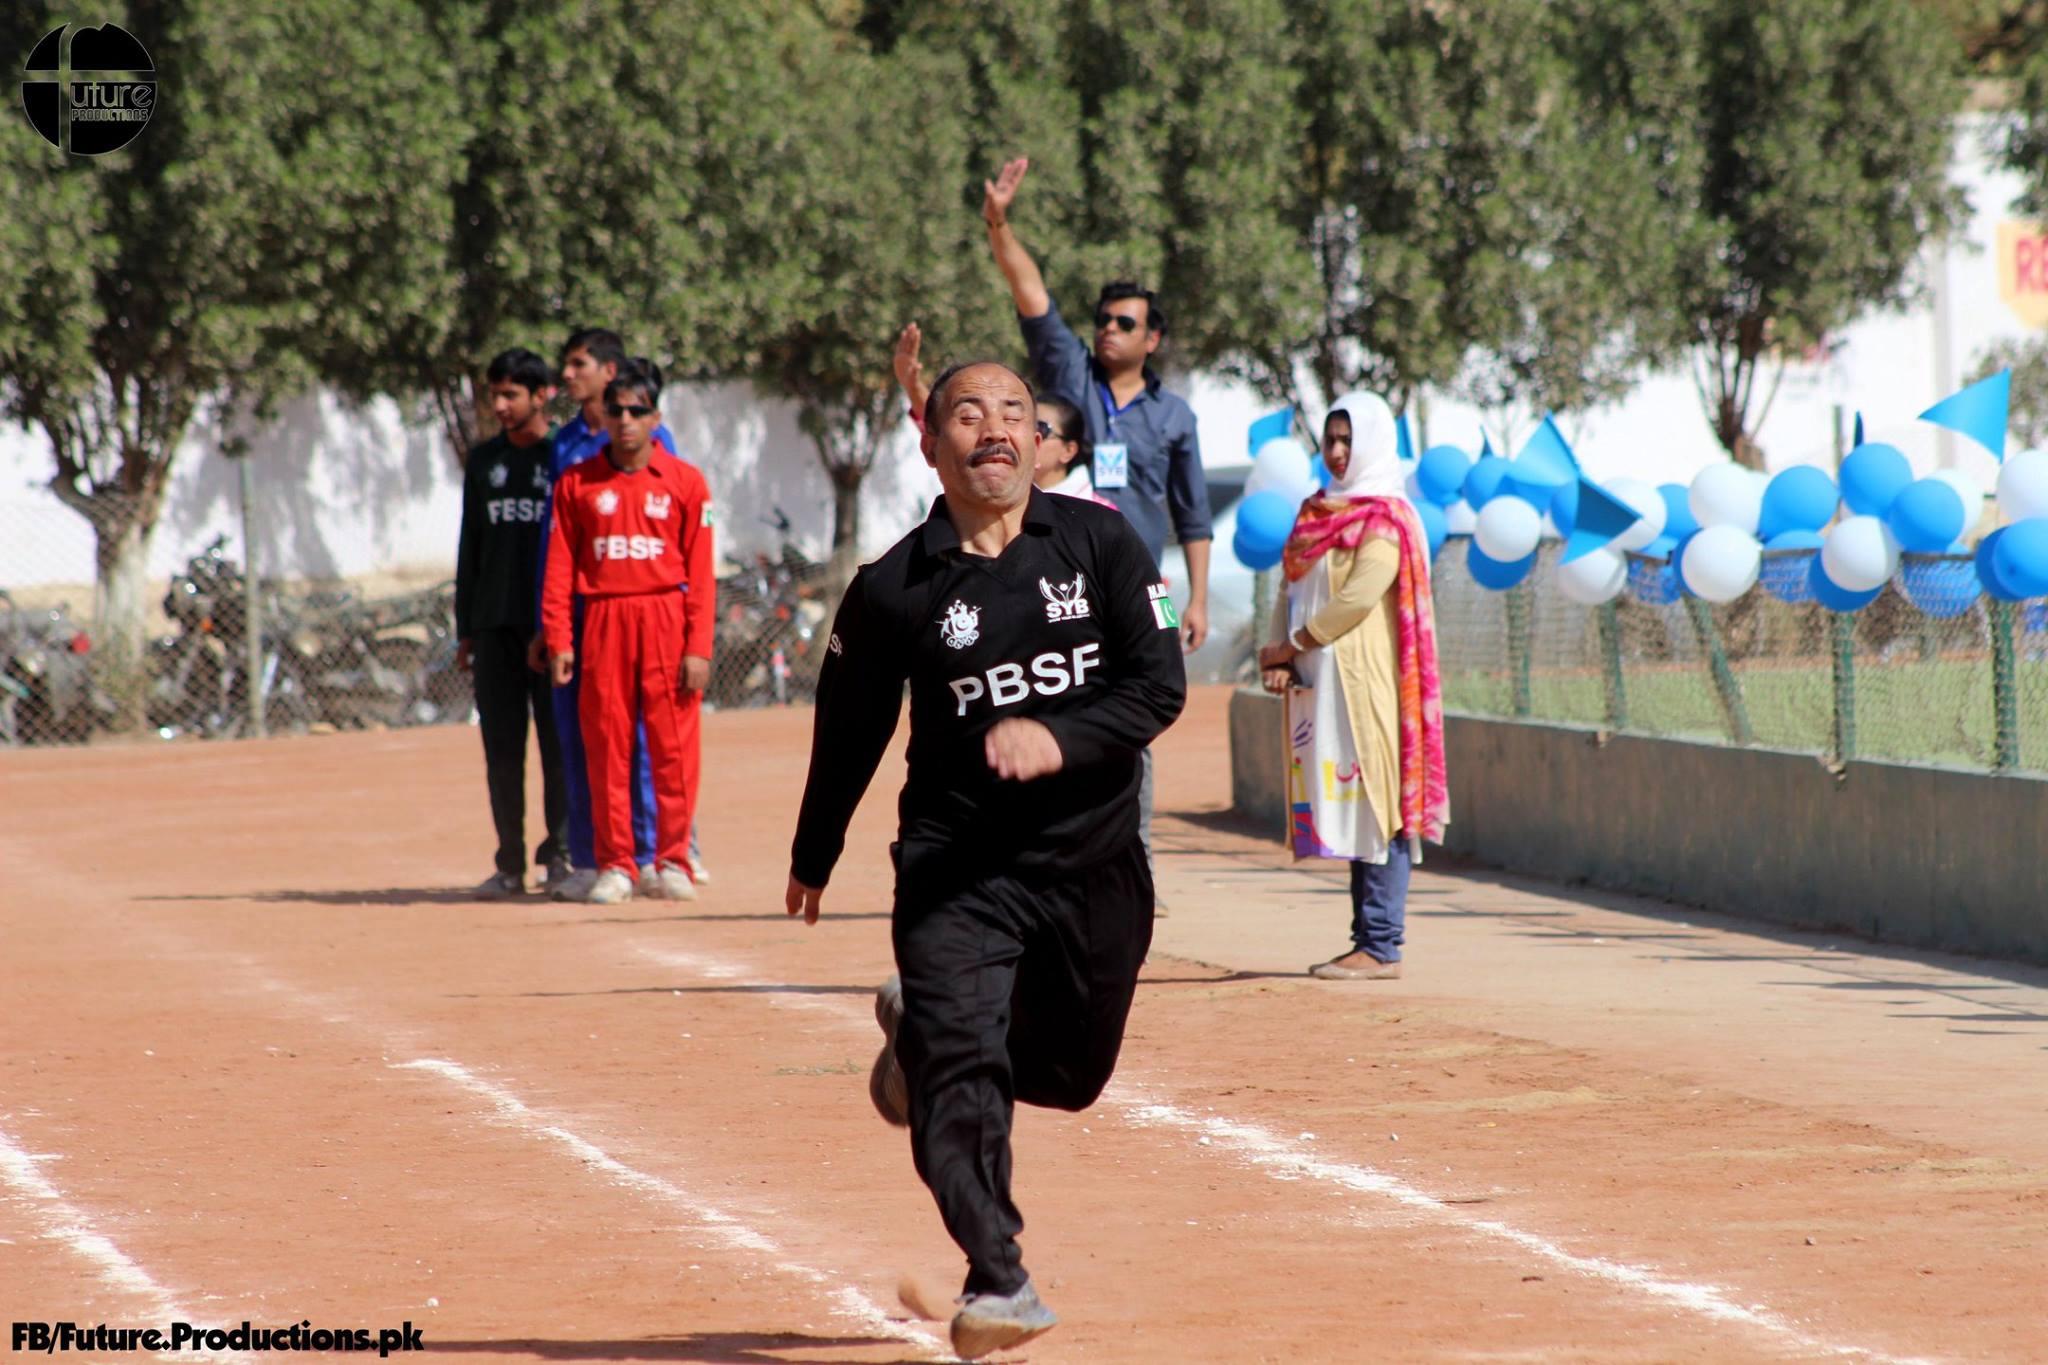 Team Gilgit-Baltistan participates in first Pakistan Blind Sports Festival – Pictorial